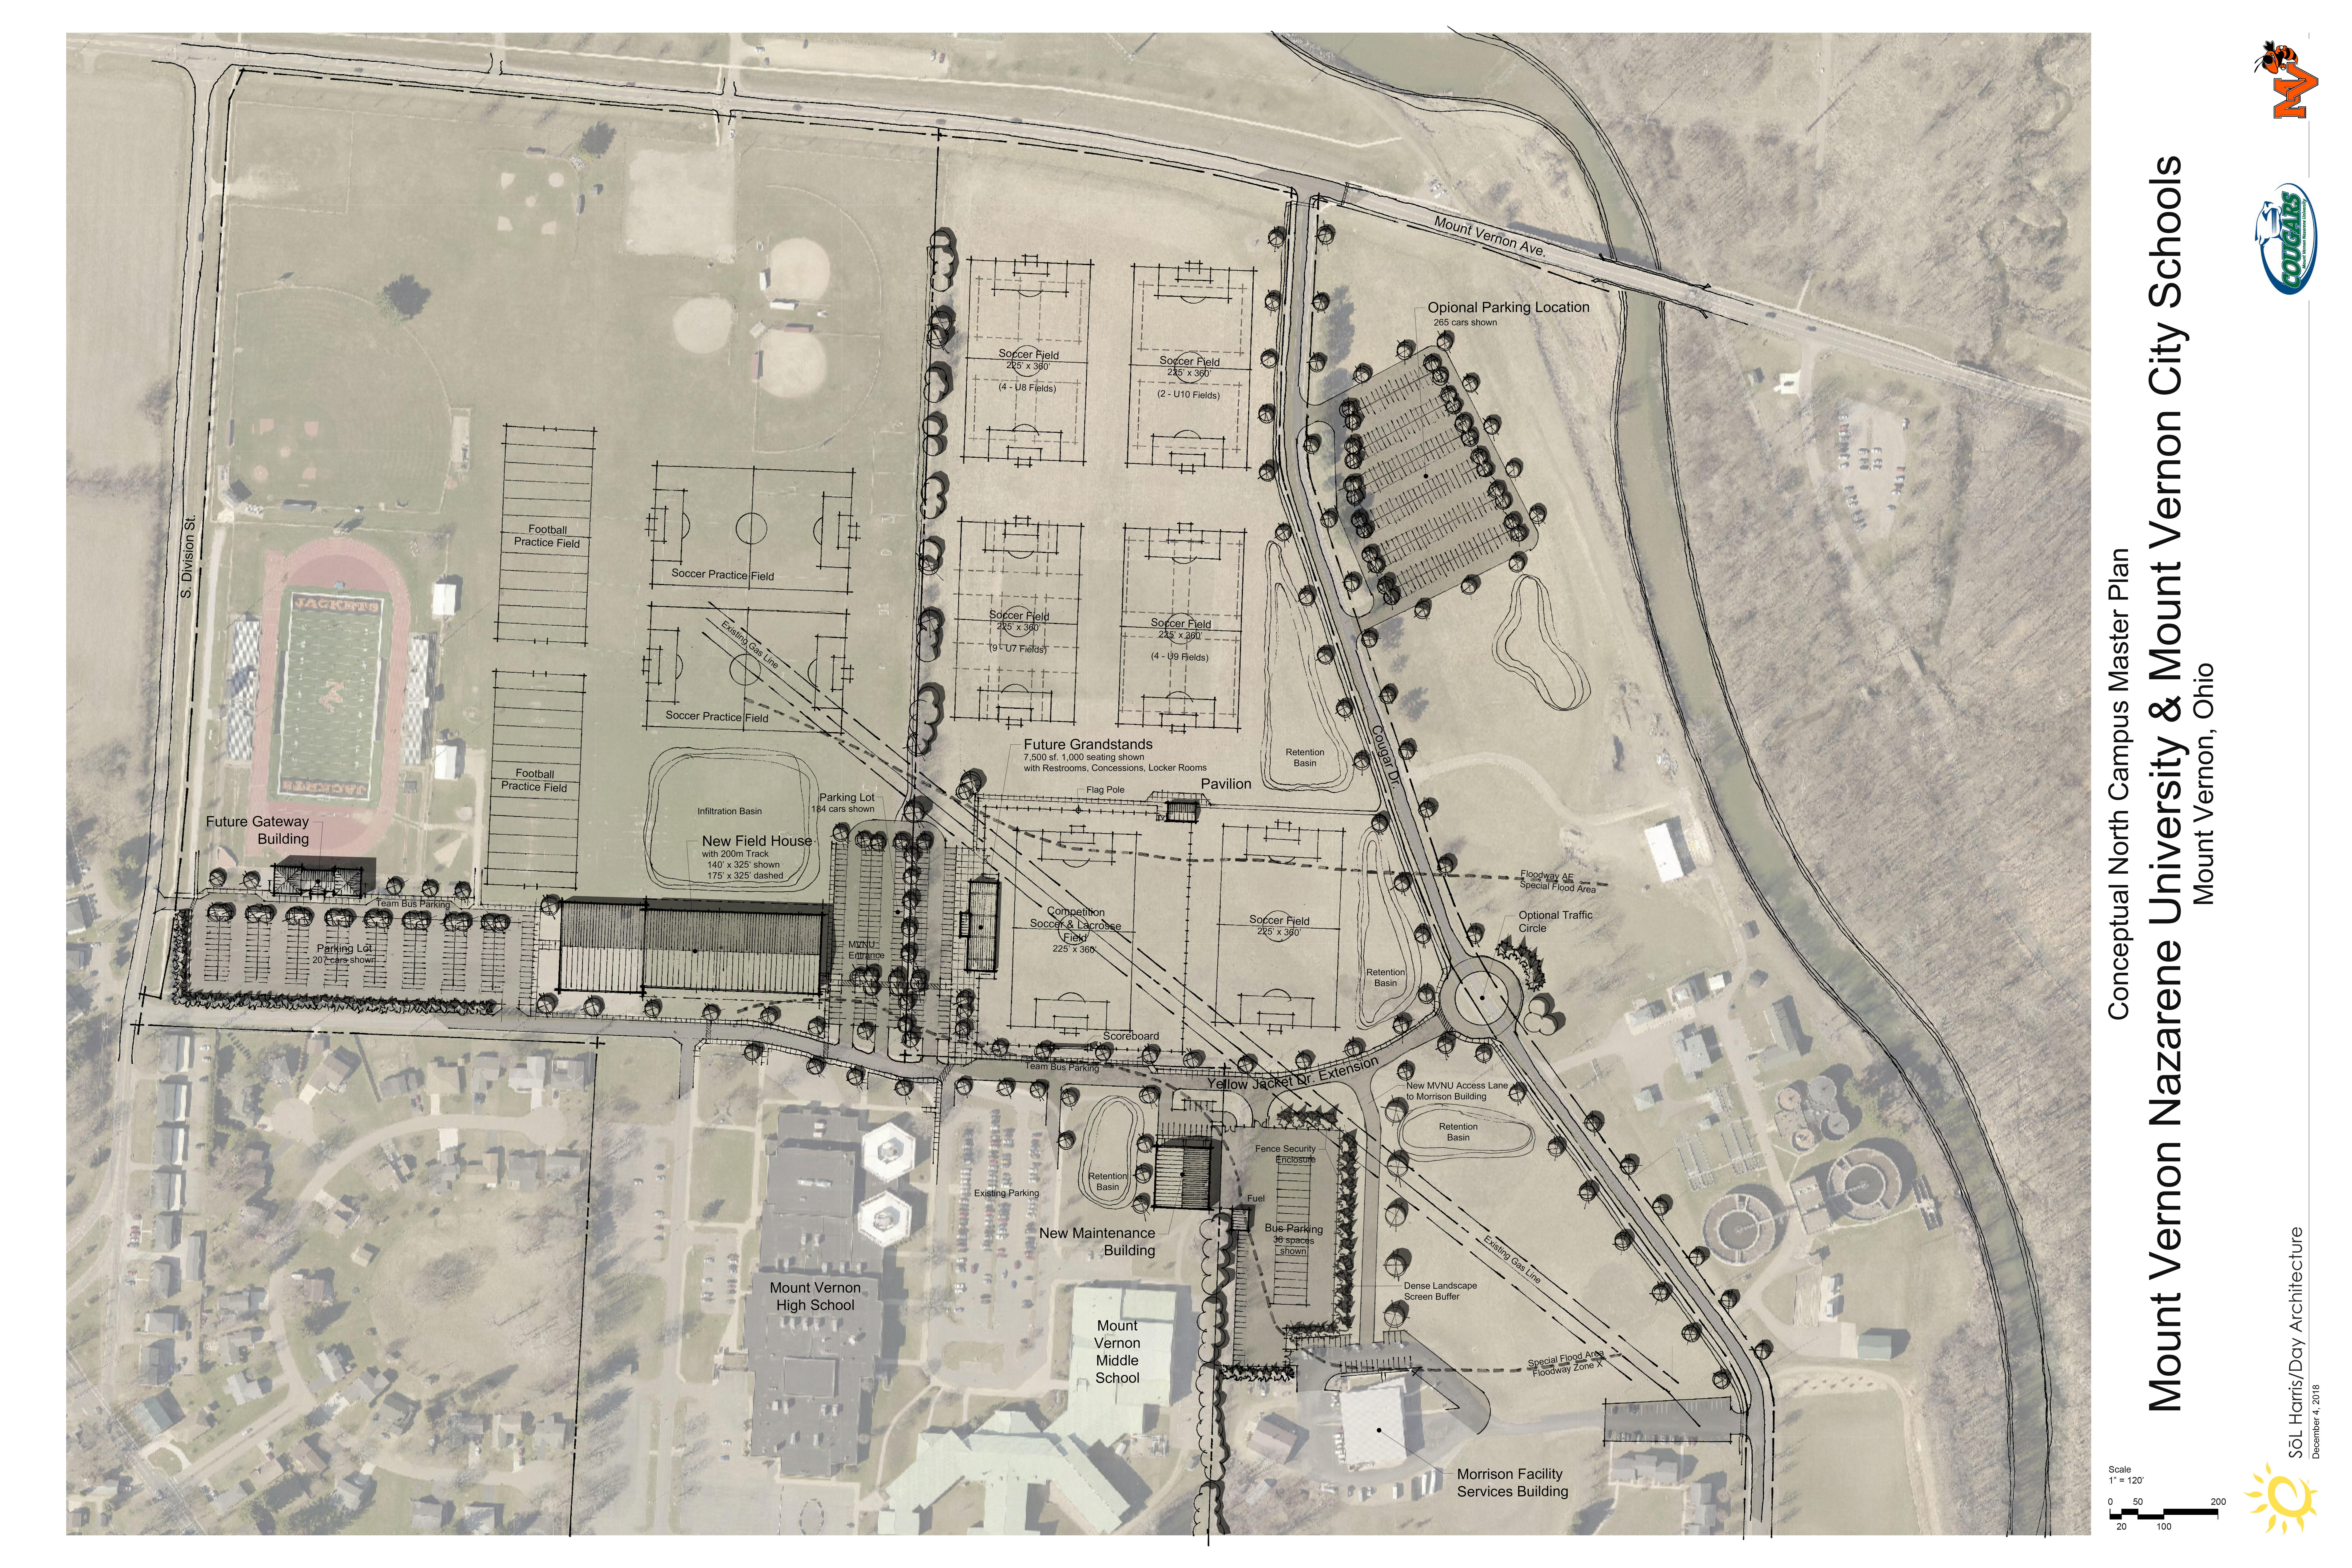 North Campus Map.psd